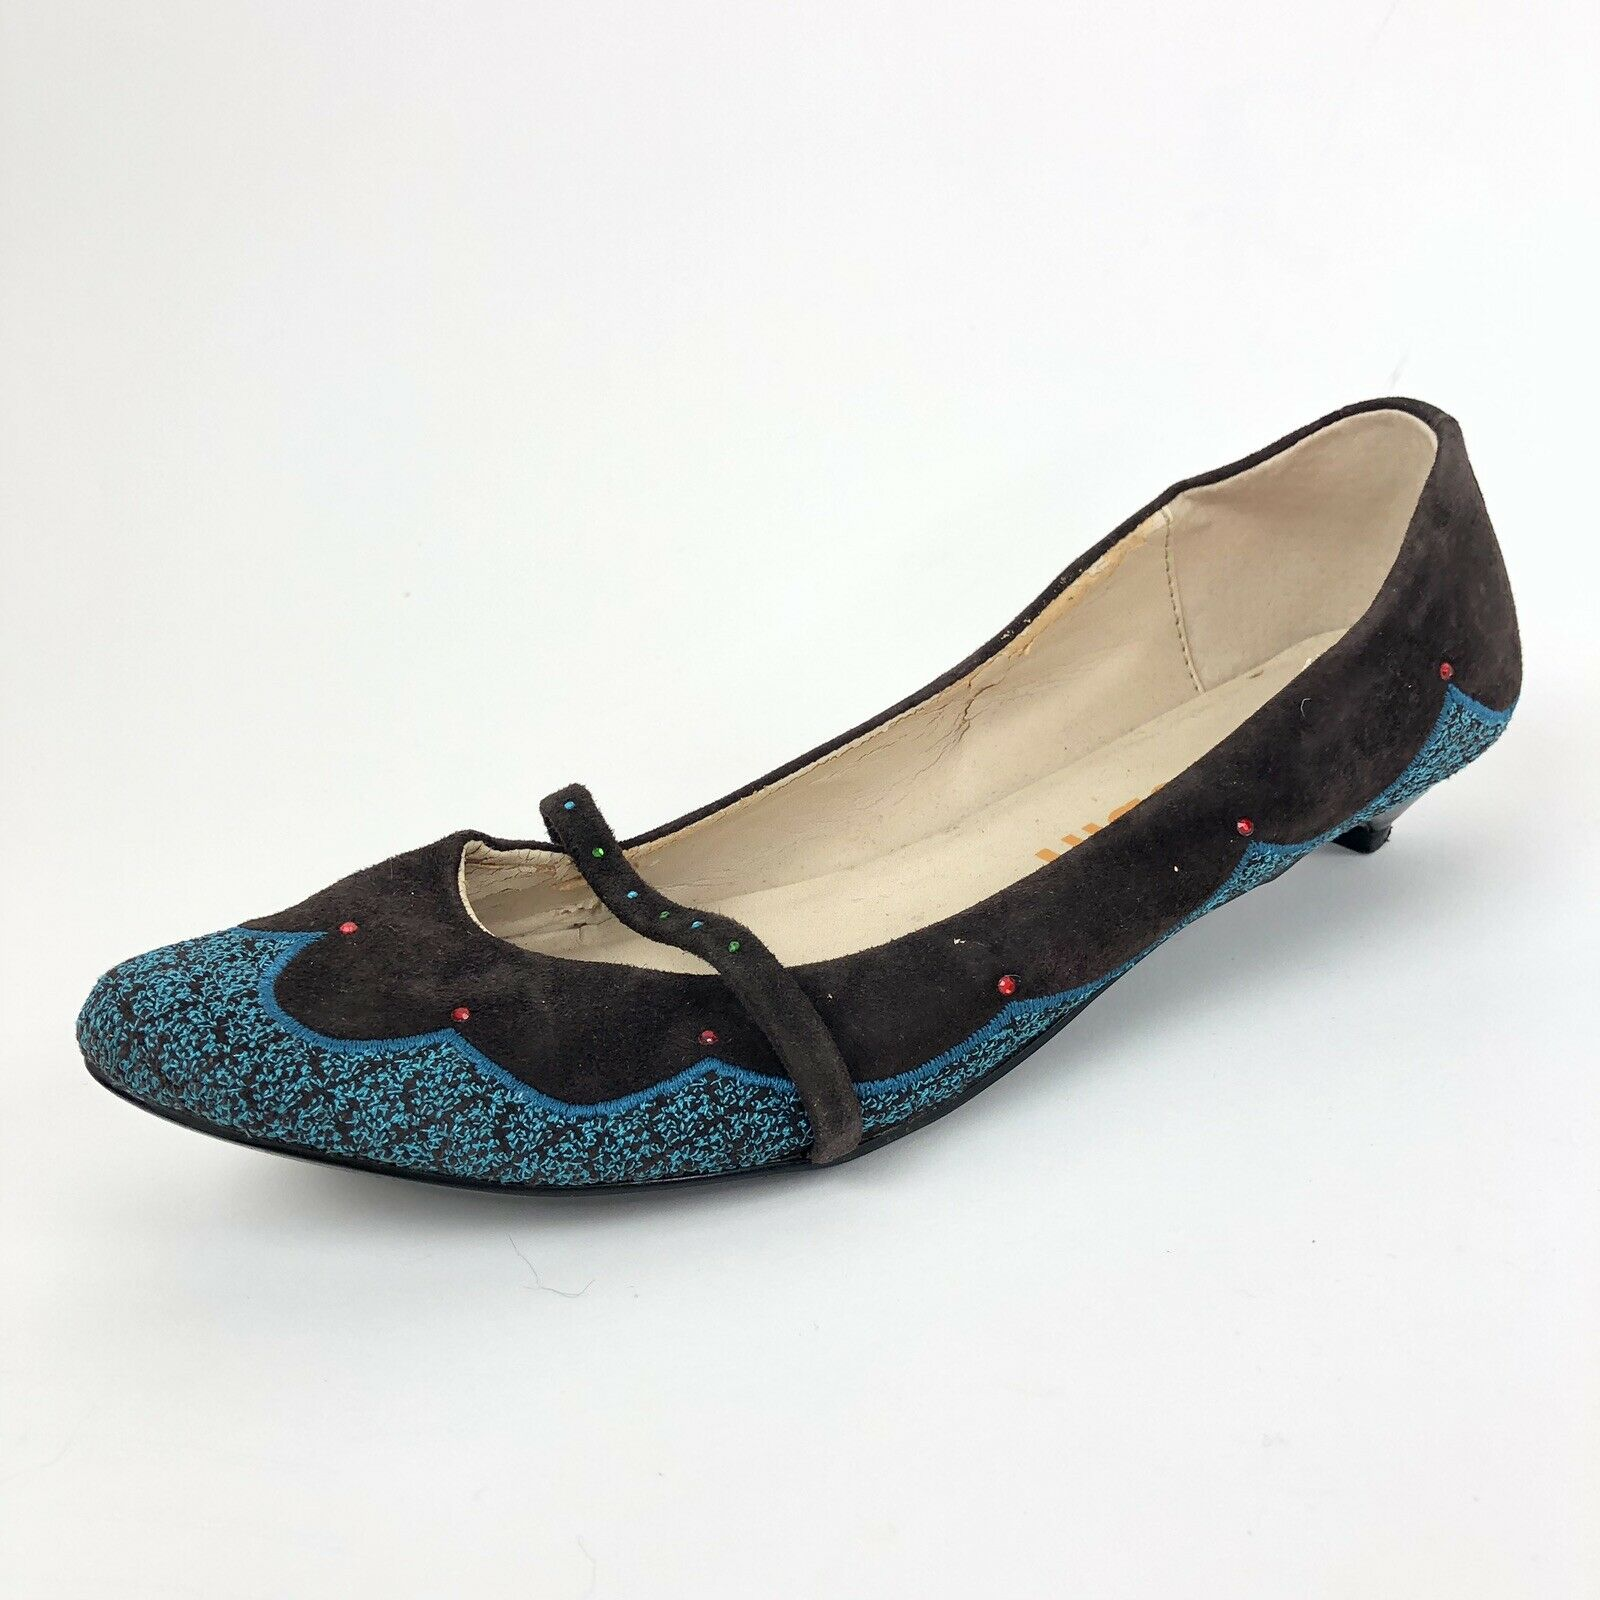 Anthropologie FarylRobin Brown Suede bluee Embroider Kitten Heels   Womens 8.5